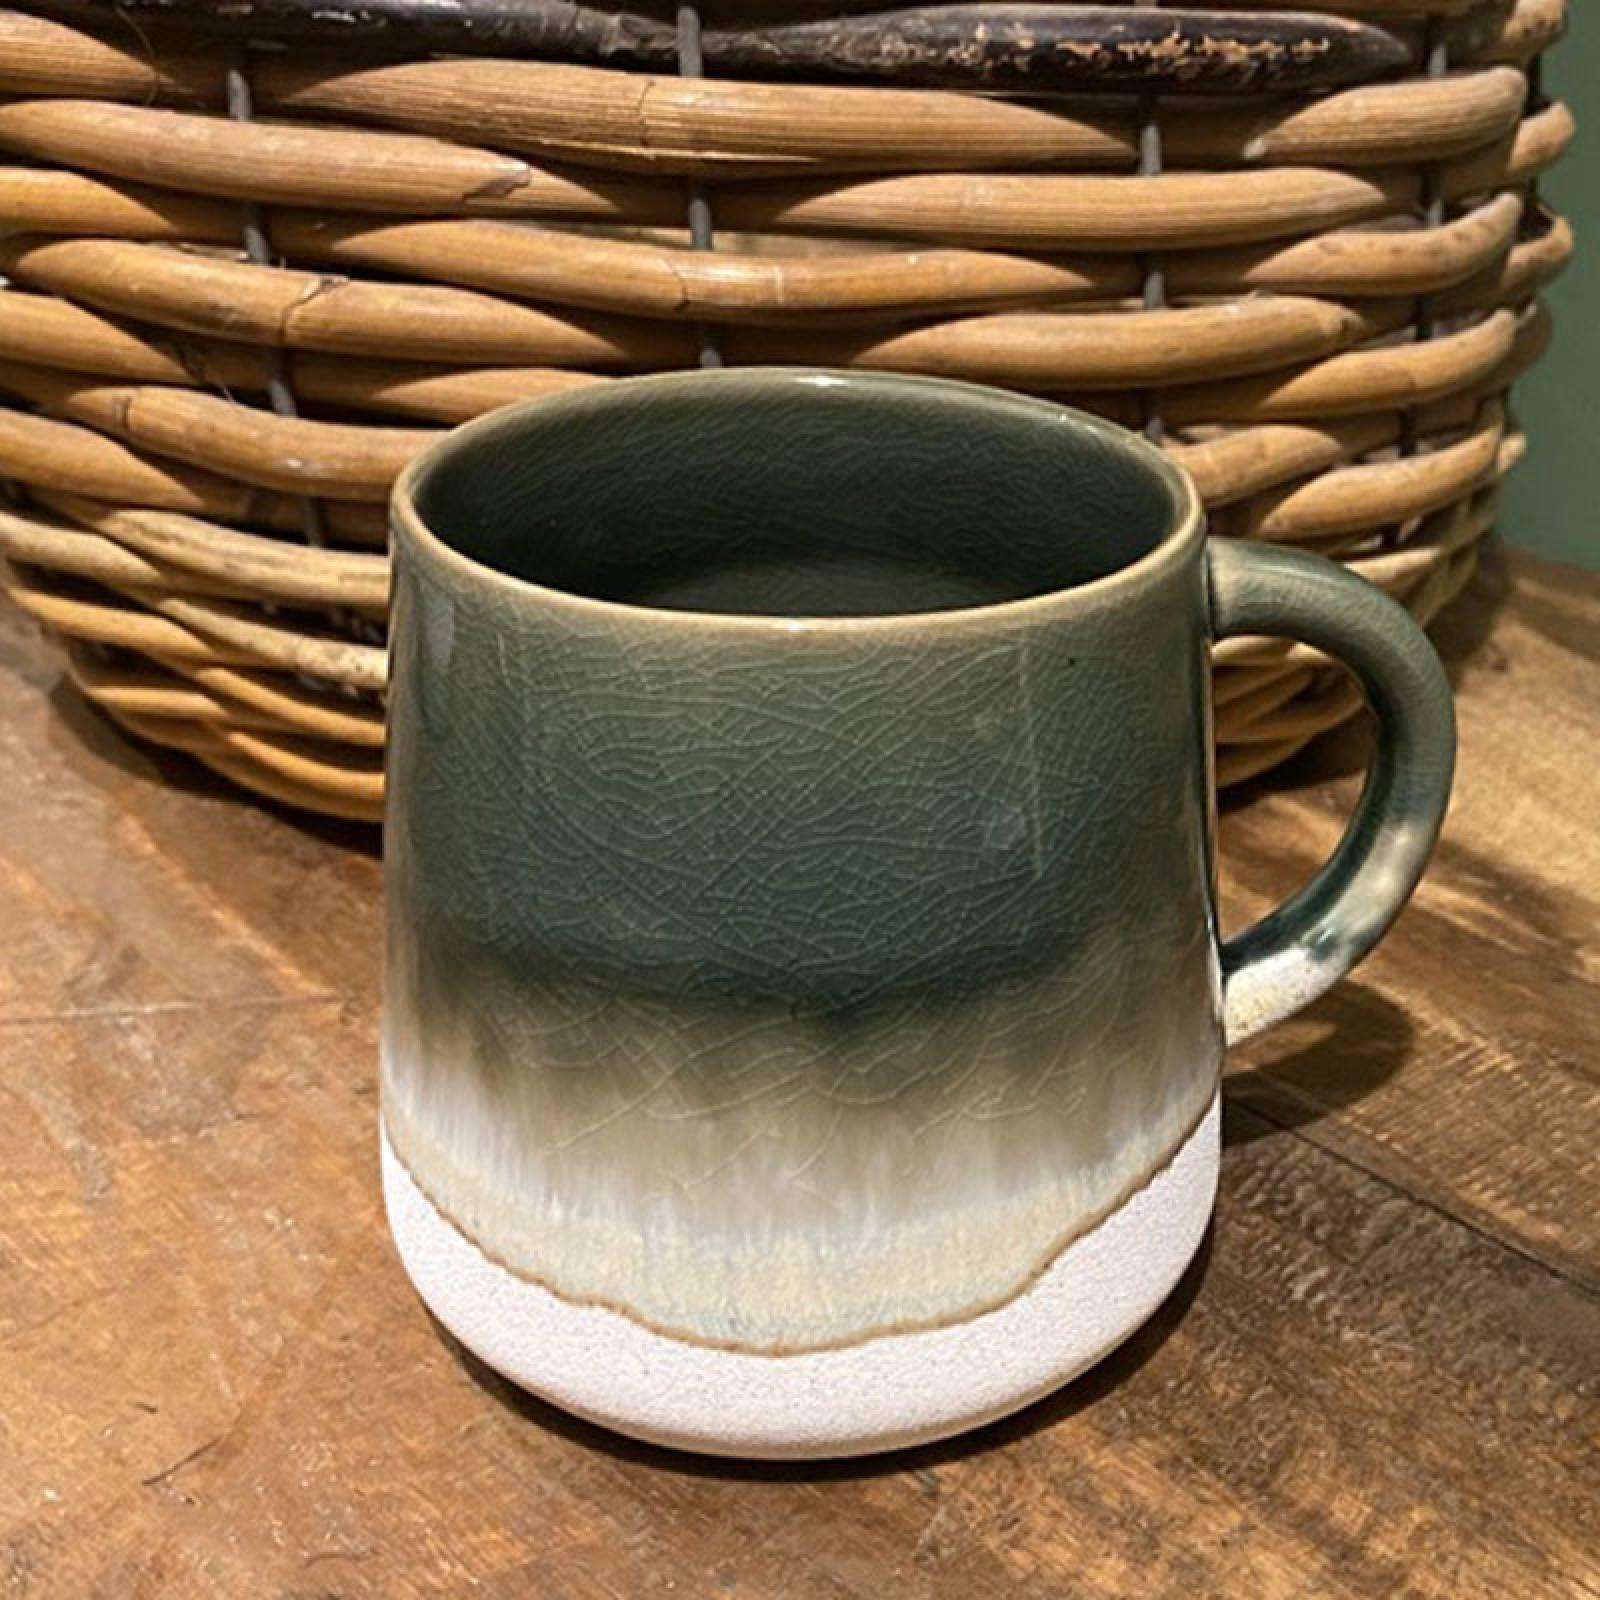 Two Tone Dip Glazed Stoneware Mug In Green thumbnails